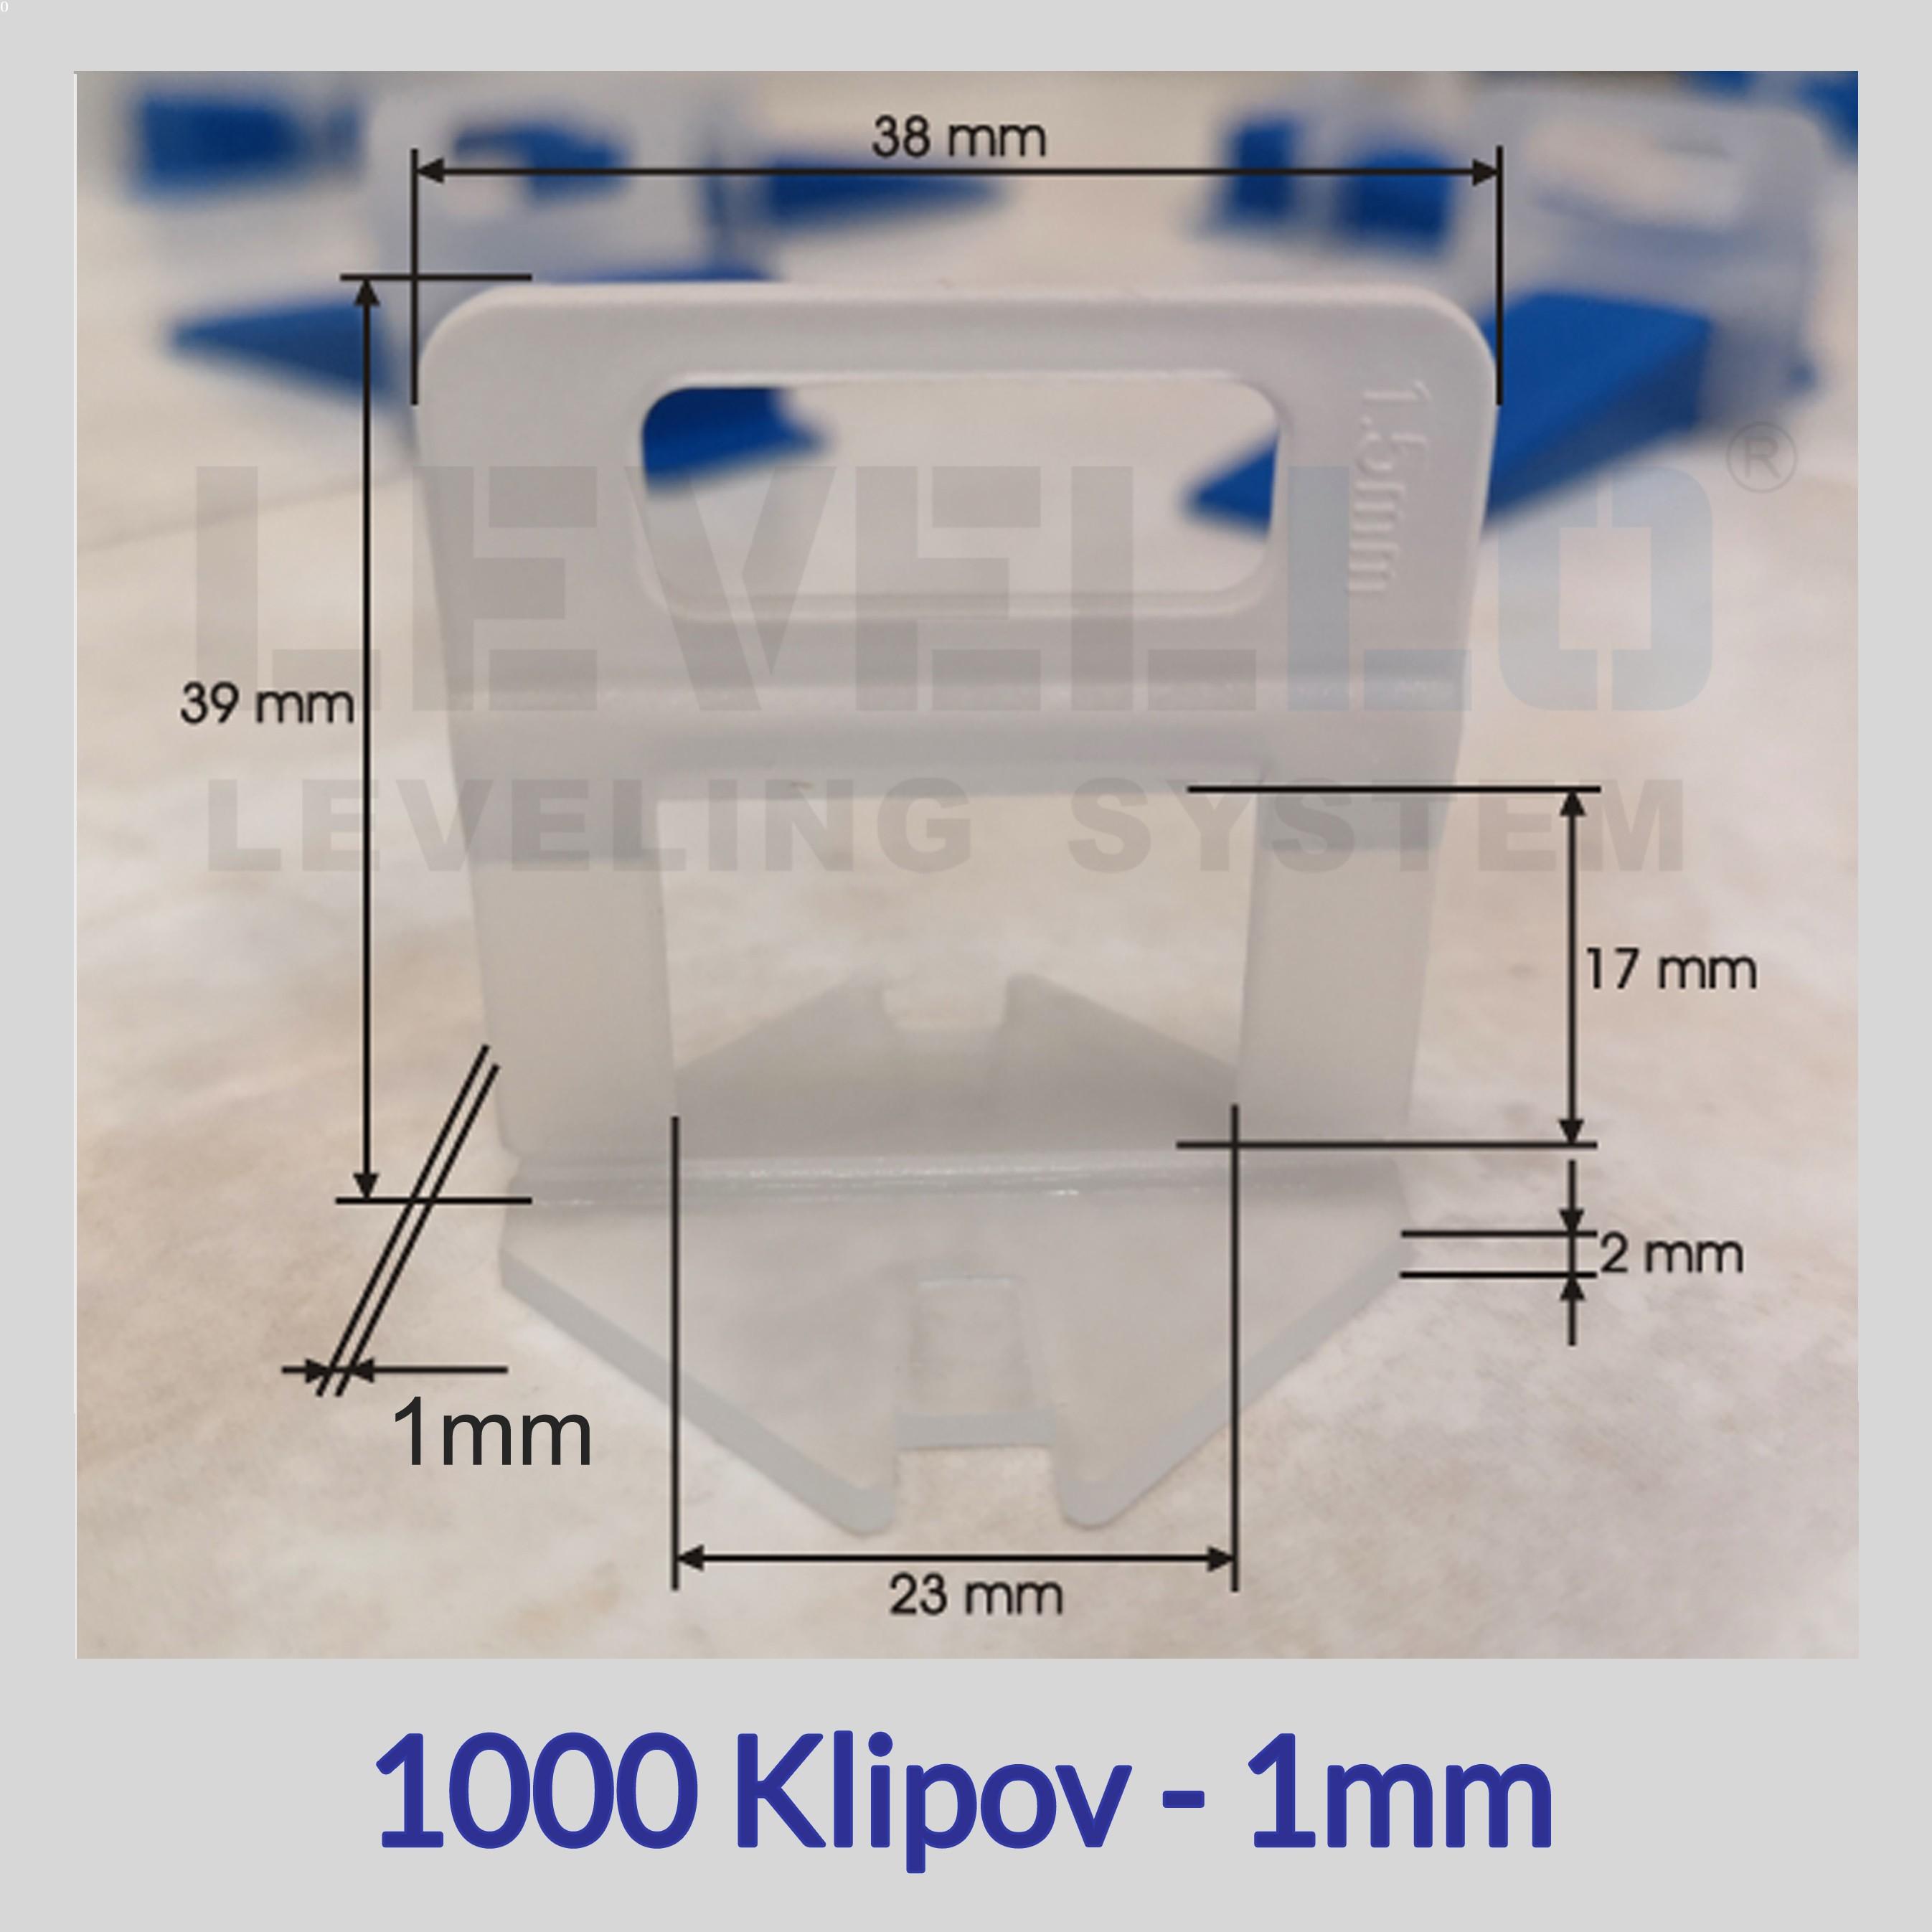 Klipy Eko LEVELLO ® 1 mm, 1000 kusov